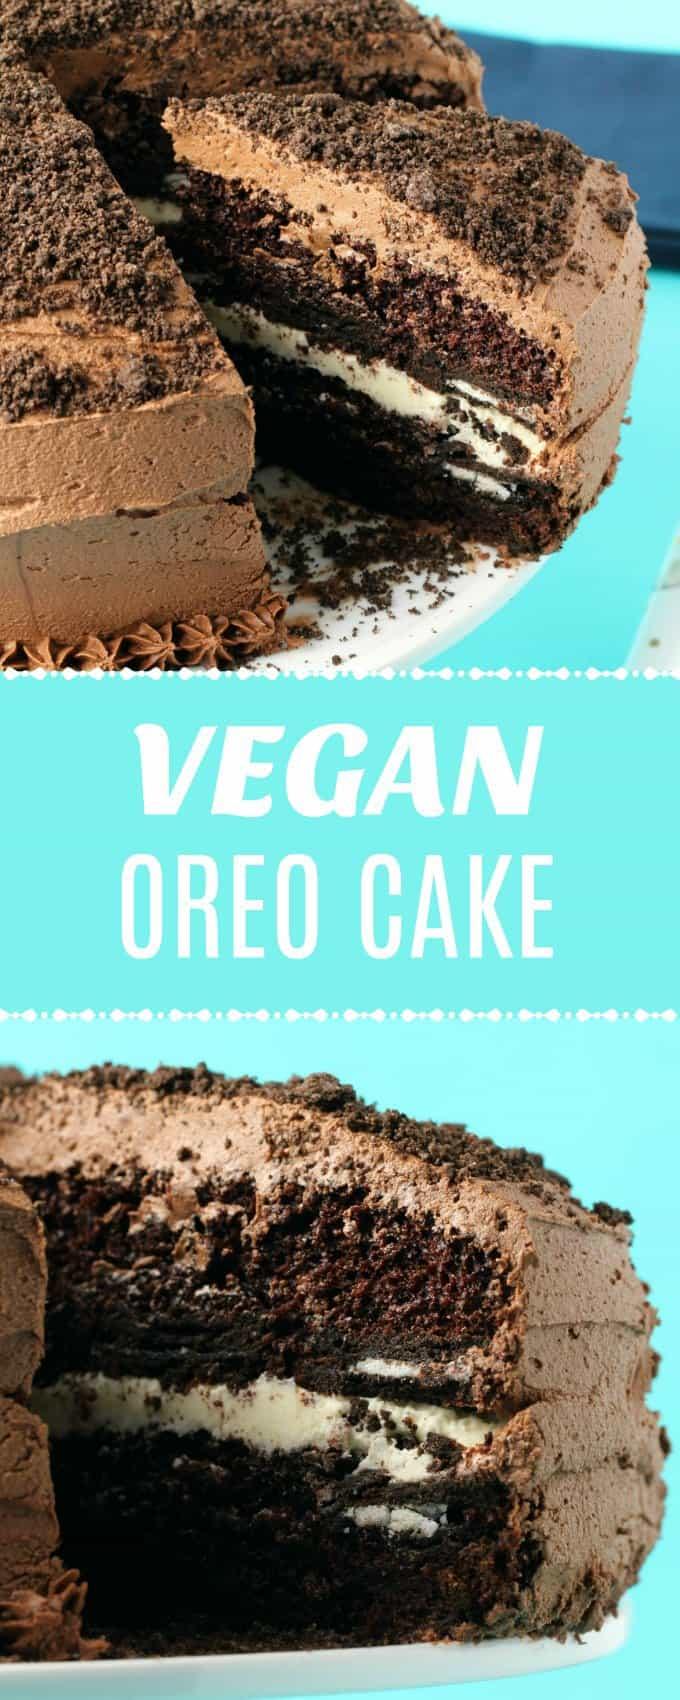 This vegan oreo cake looks like a giant oreo cookie! Oreo cookies are baked into the chocolate cake layers and it has a creamy vanilla center and vegan chocolate buttercream frosting.#vegan #dairyfree #dessert   lovingitvegan.com